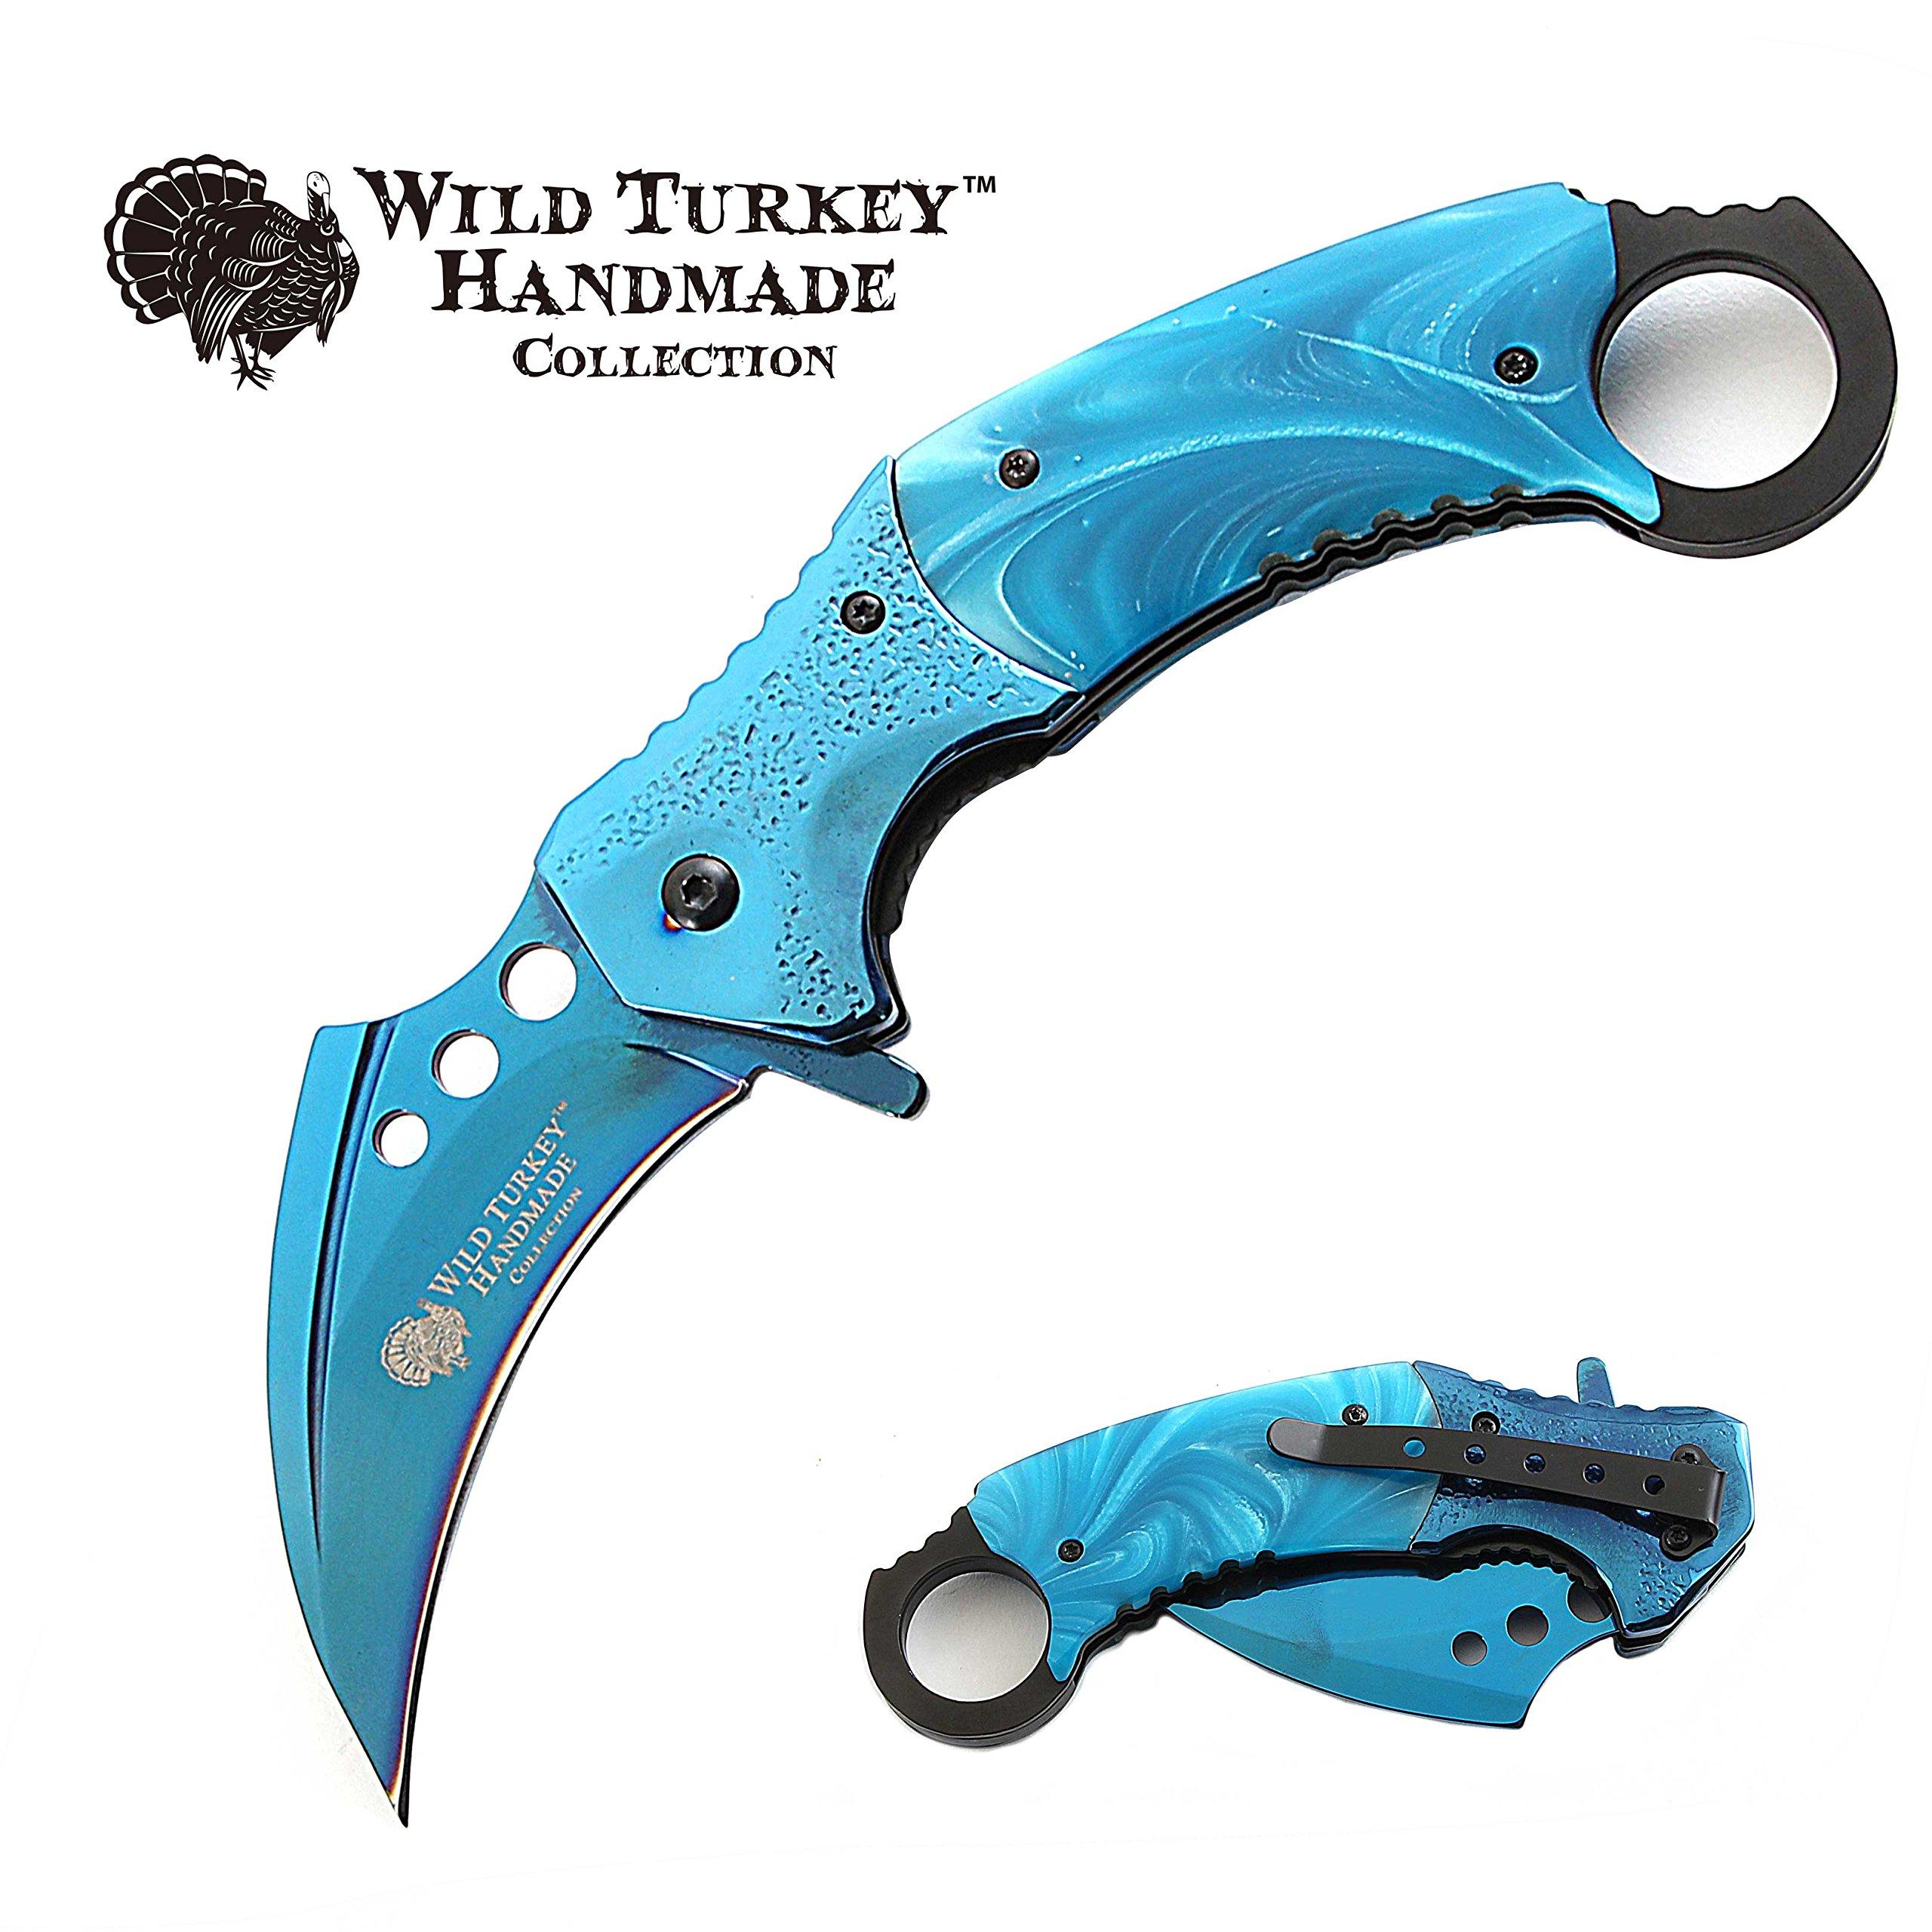 Wild Turkey Handmade Heavy Duty Hawk Bill Designed Karambit Spring Assisted Knife Hunting Camping Fishing Outdoors Lightning Fast Deployment - Razor Sharp Blade (Blue)